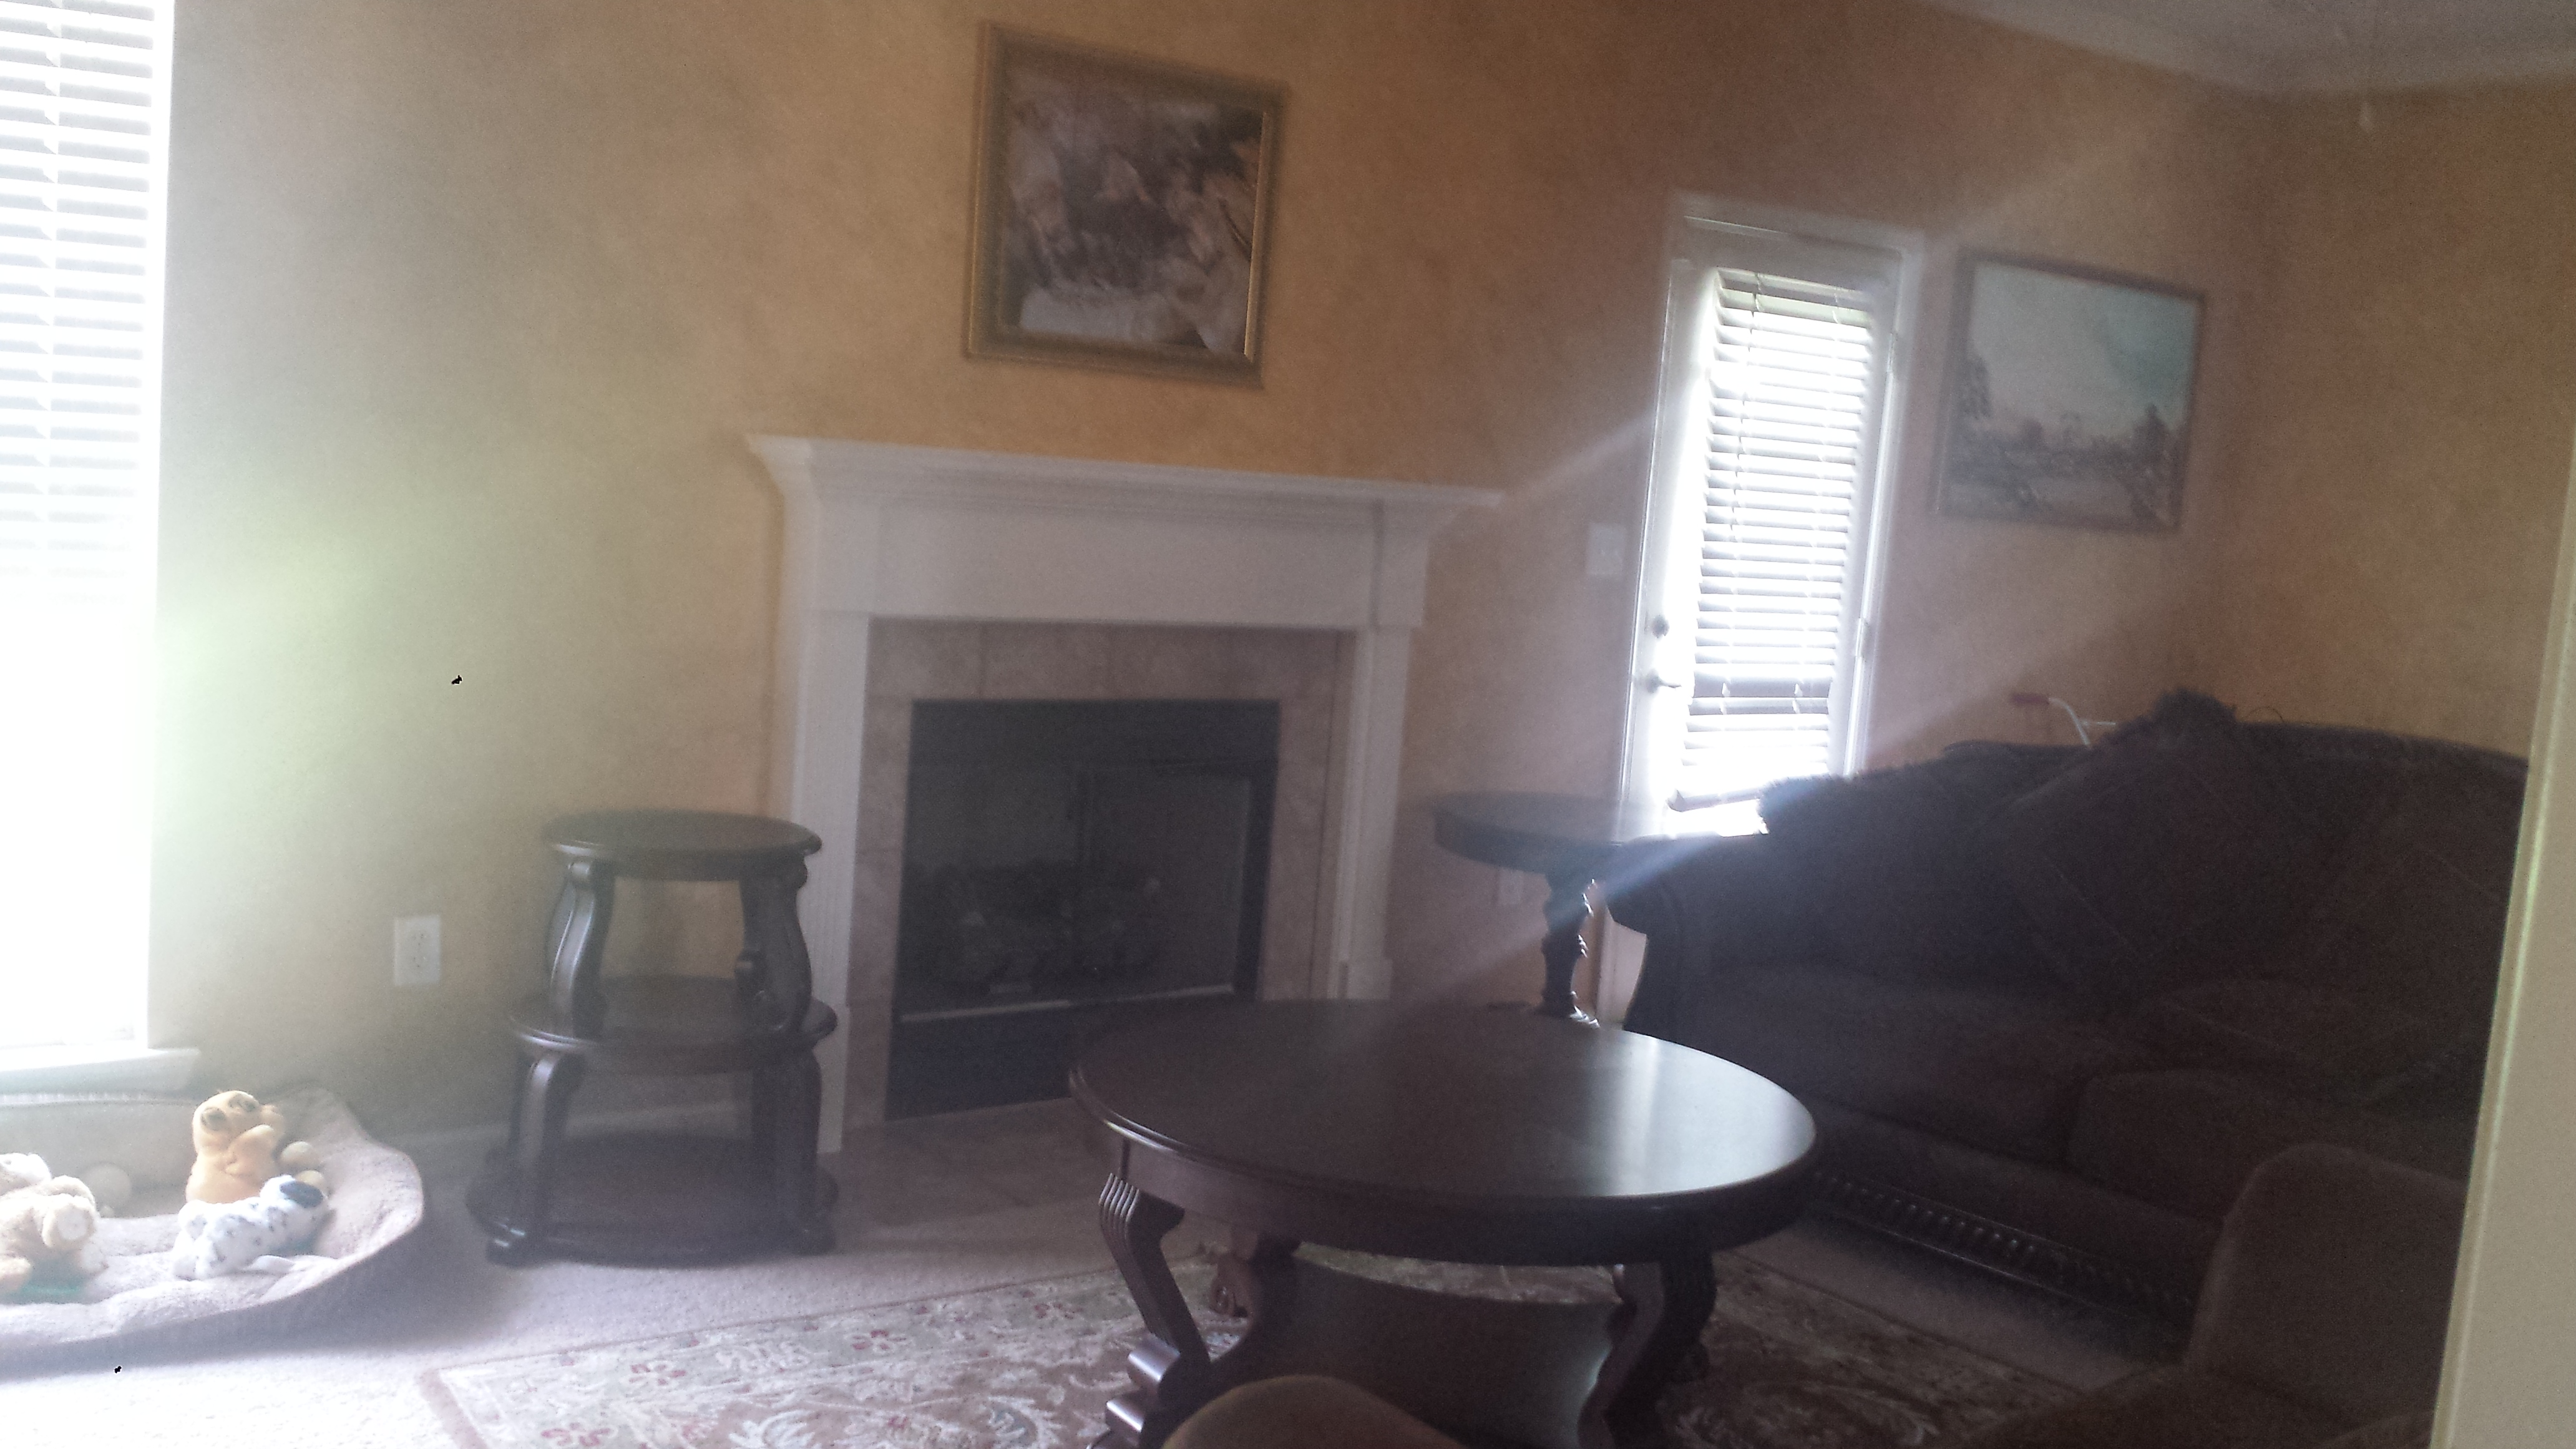 Trey_livingroom2